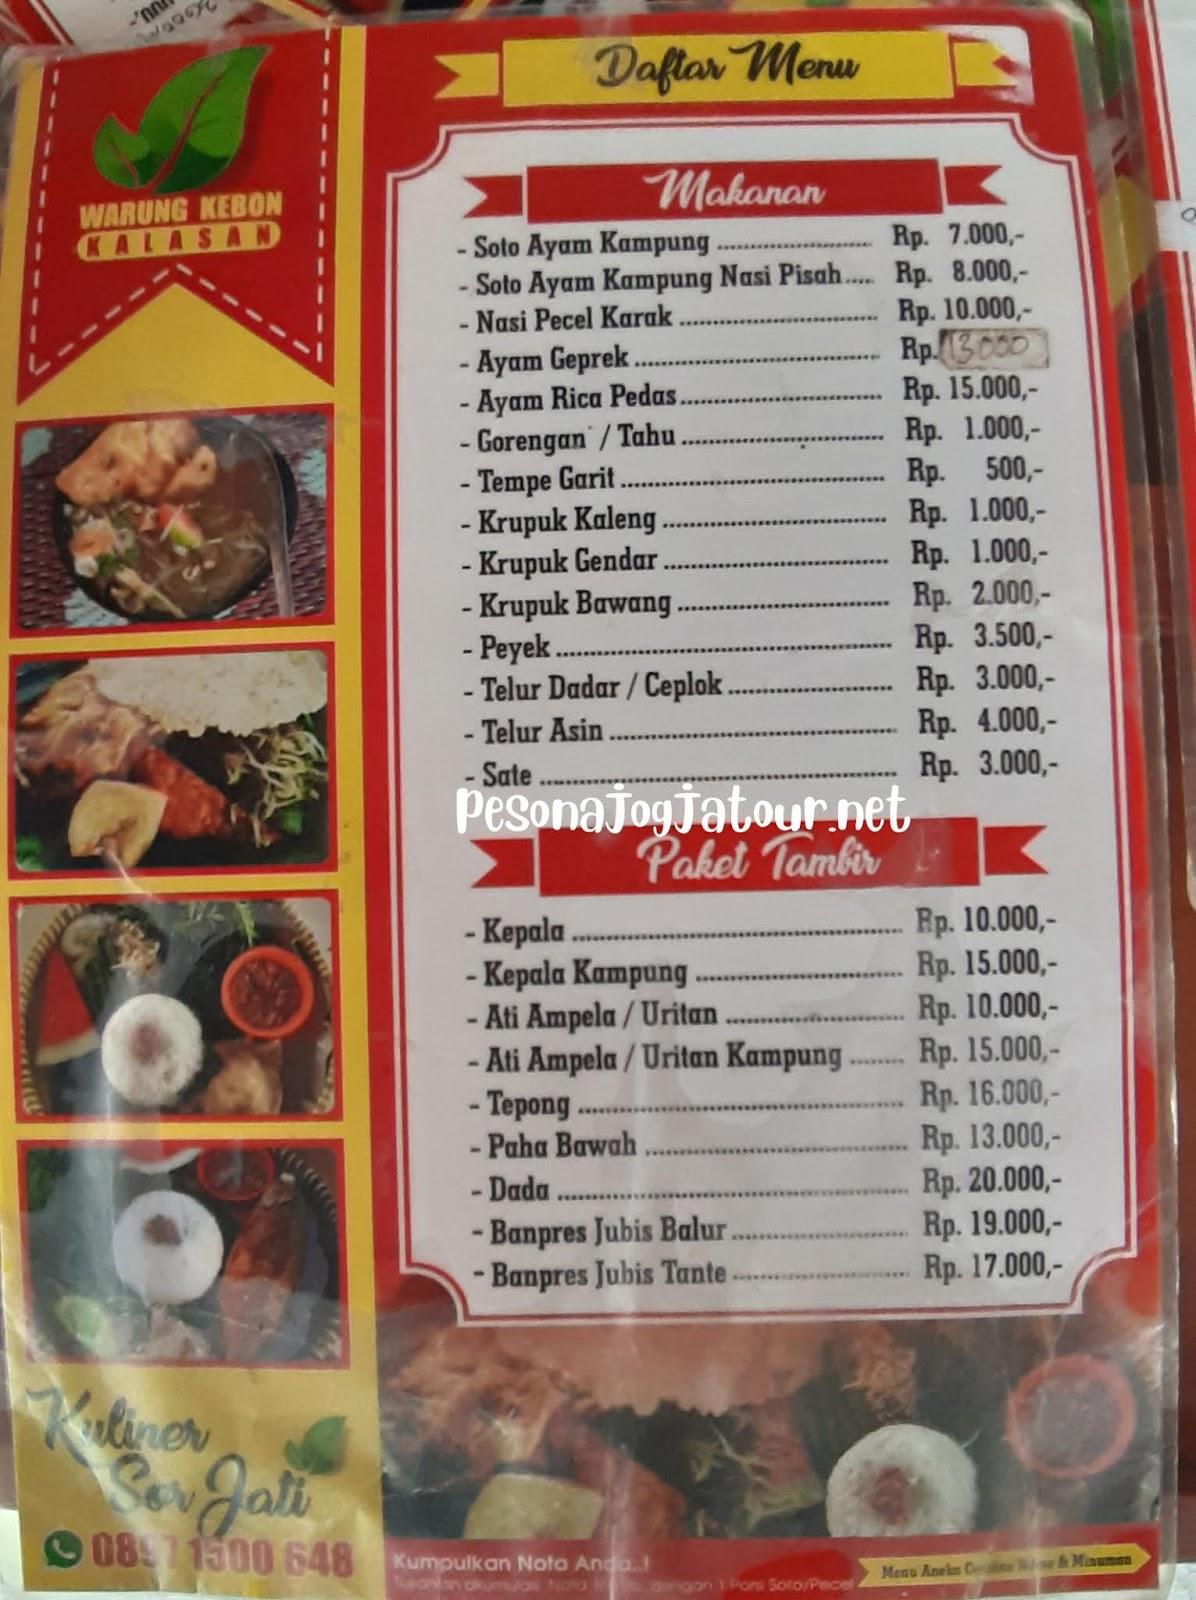 Daftar harga menu makanan warung kebon kalasan